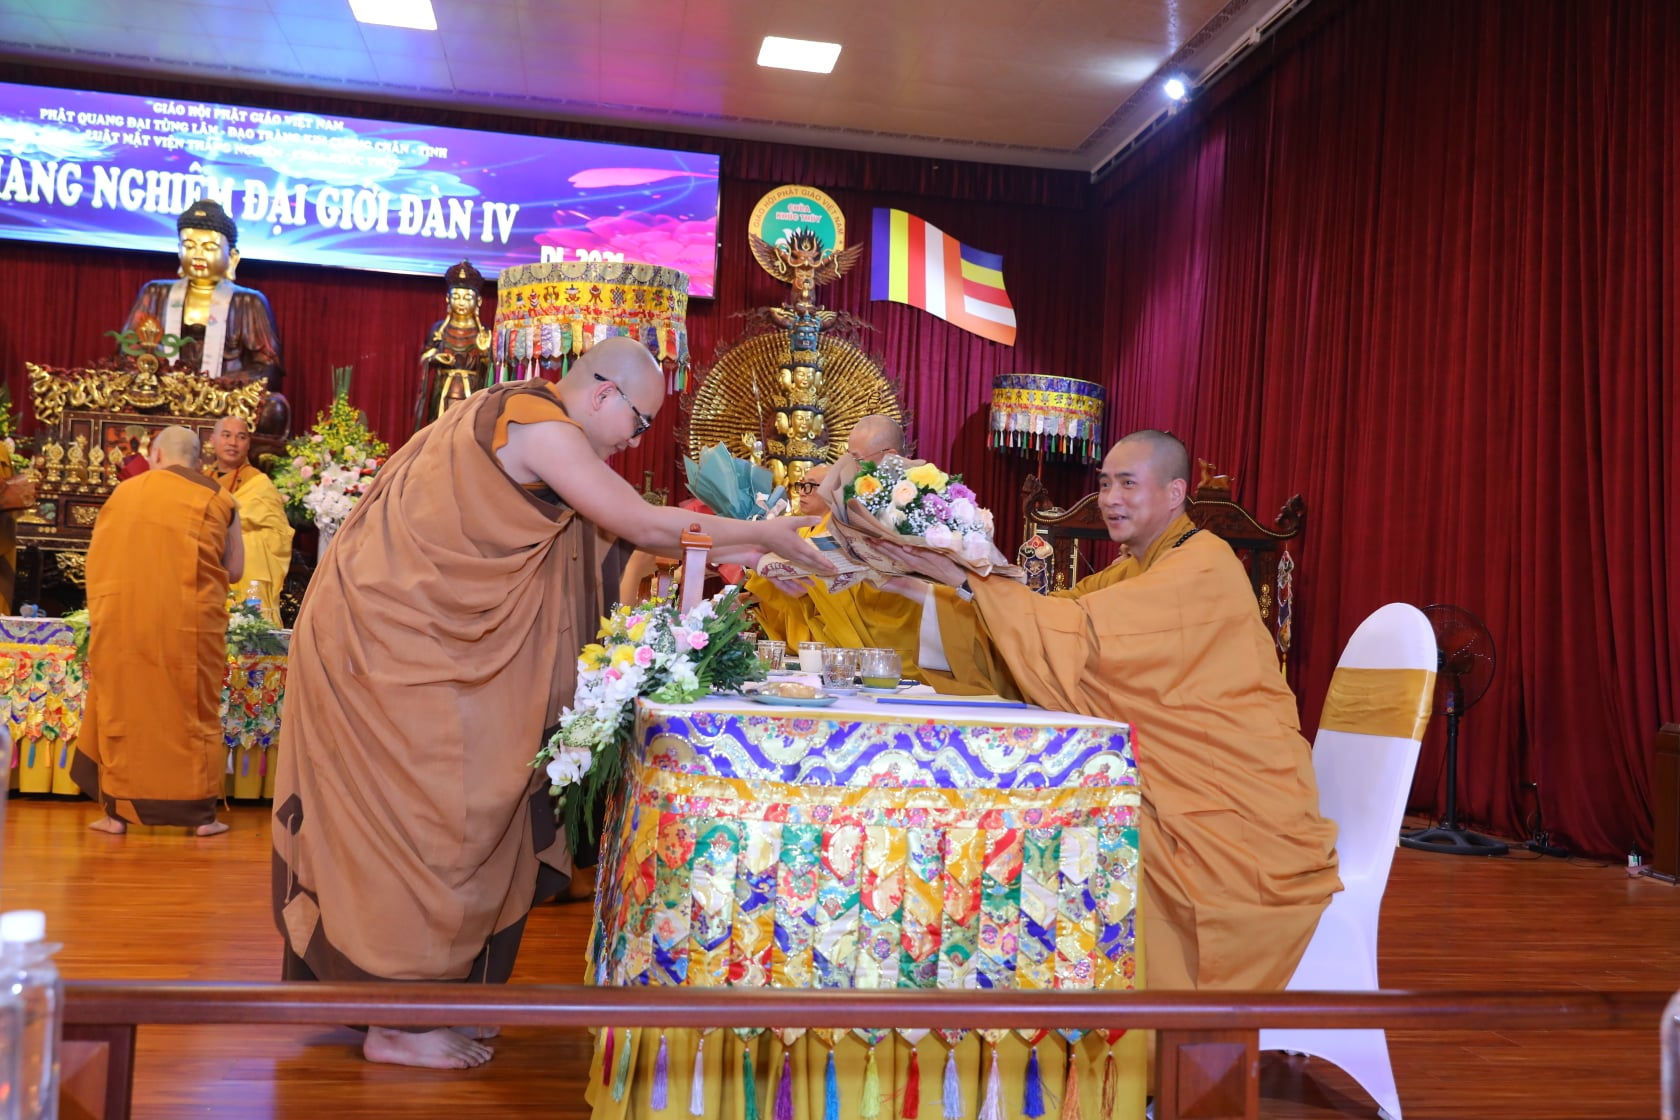 Thang Nghiem Dai Gioi Dan IV (14)